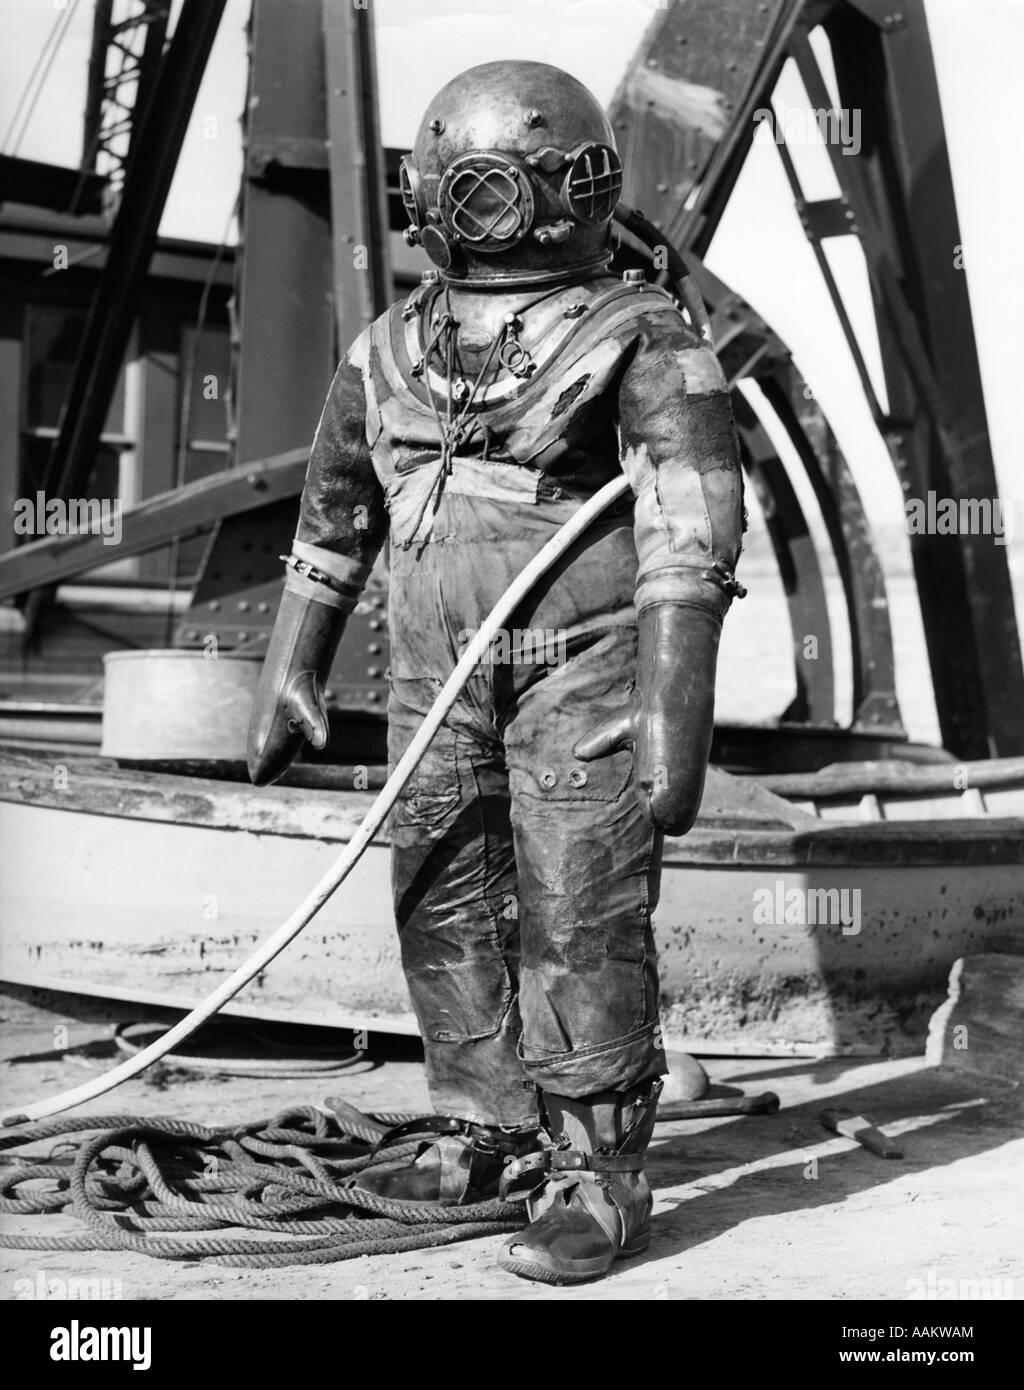 1930 1940 figura COMPLETA DEL HOMBRE EN HARD HAT SUBMARINA traje de buceo en mar profundo Foto de stock